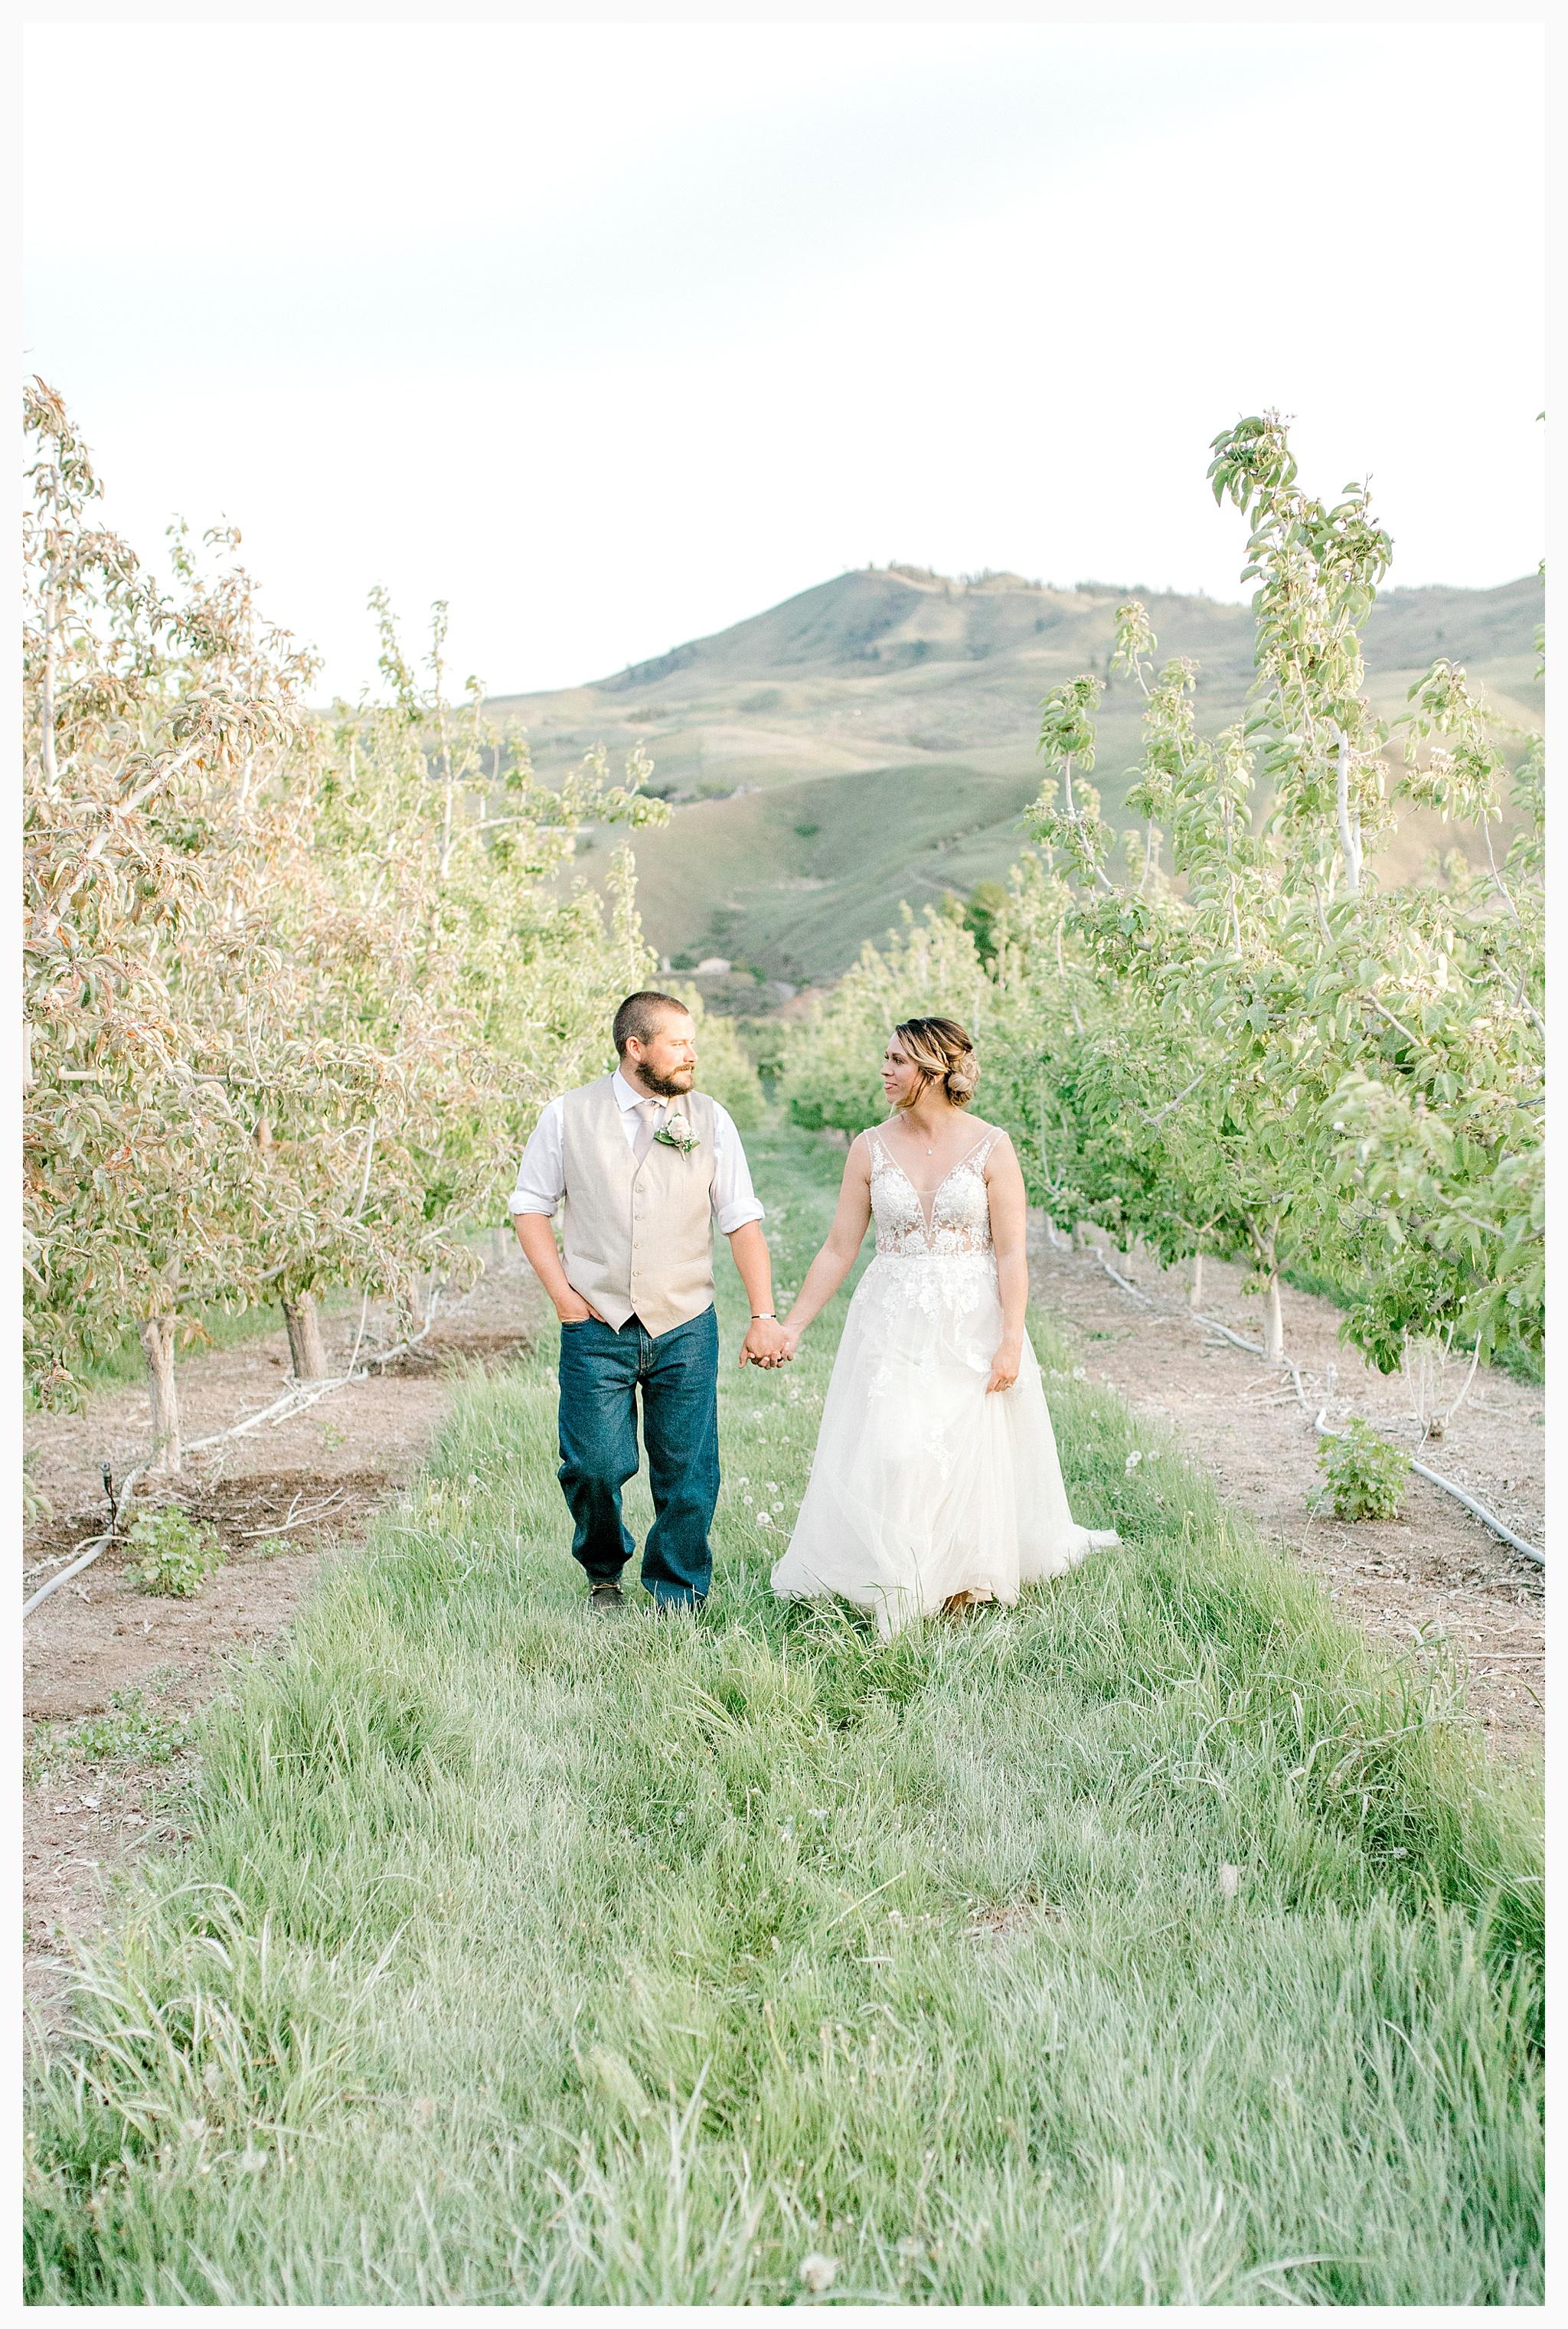 Rustic barn wedding in Wenatchee Washington at Sunshine Ranch on Easy Street, Emma Rose Company Seattle PNW Light and Airy Wedding Photographer_0140.jpg